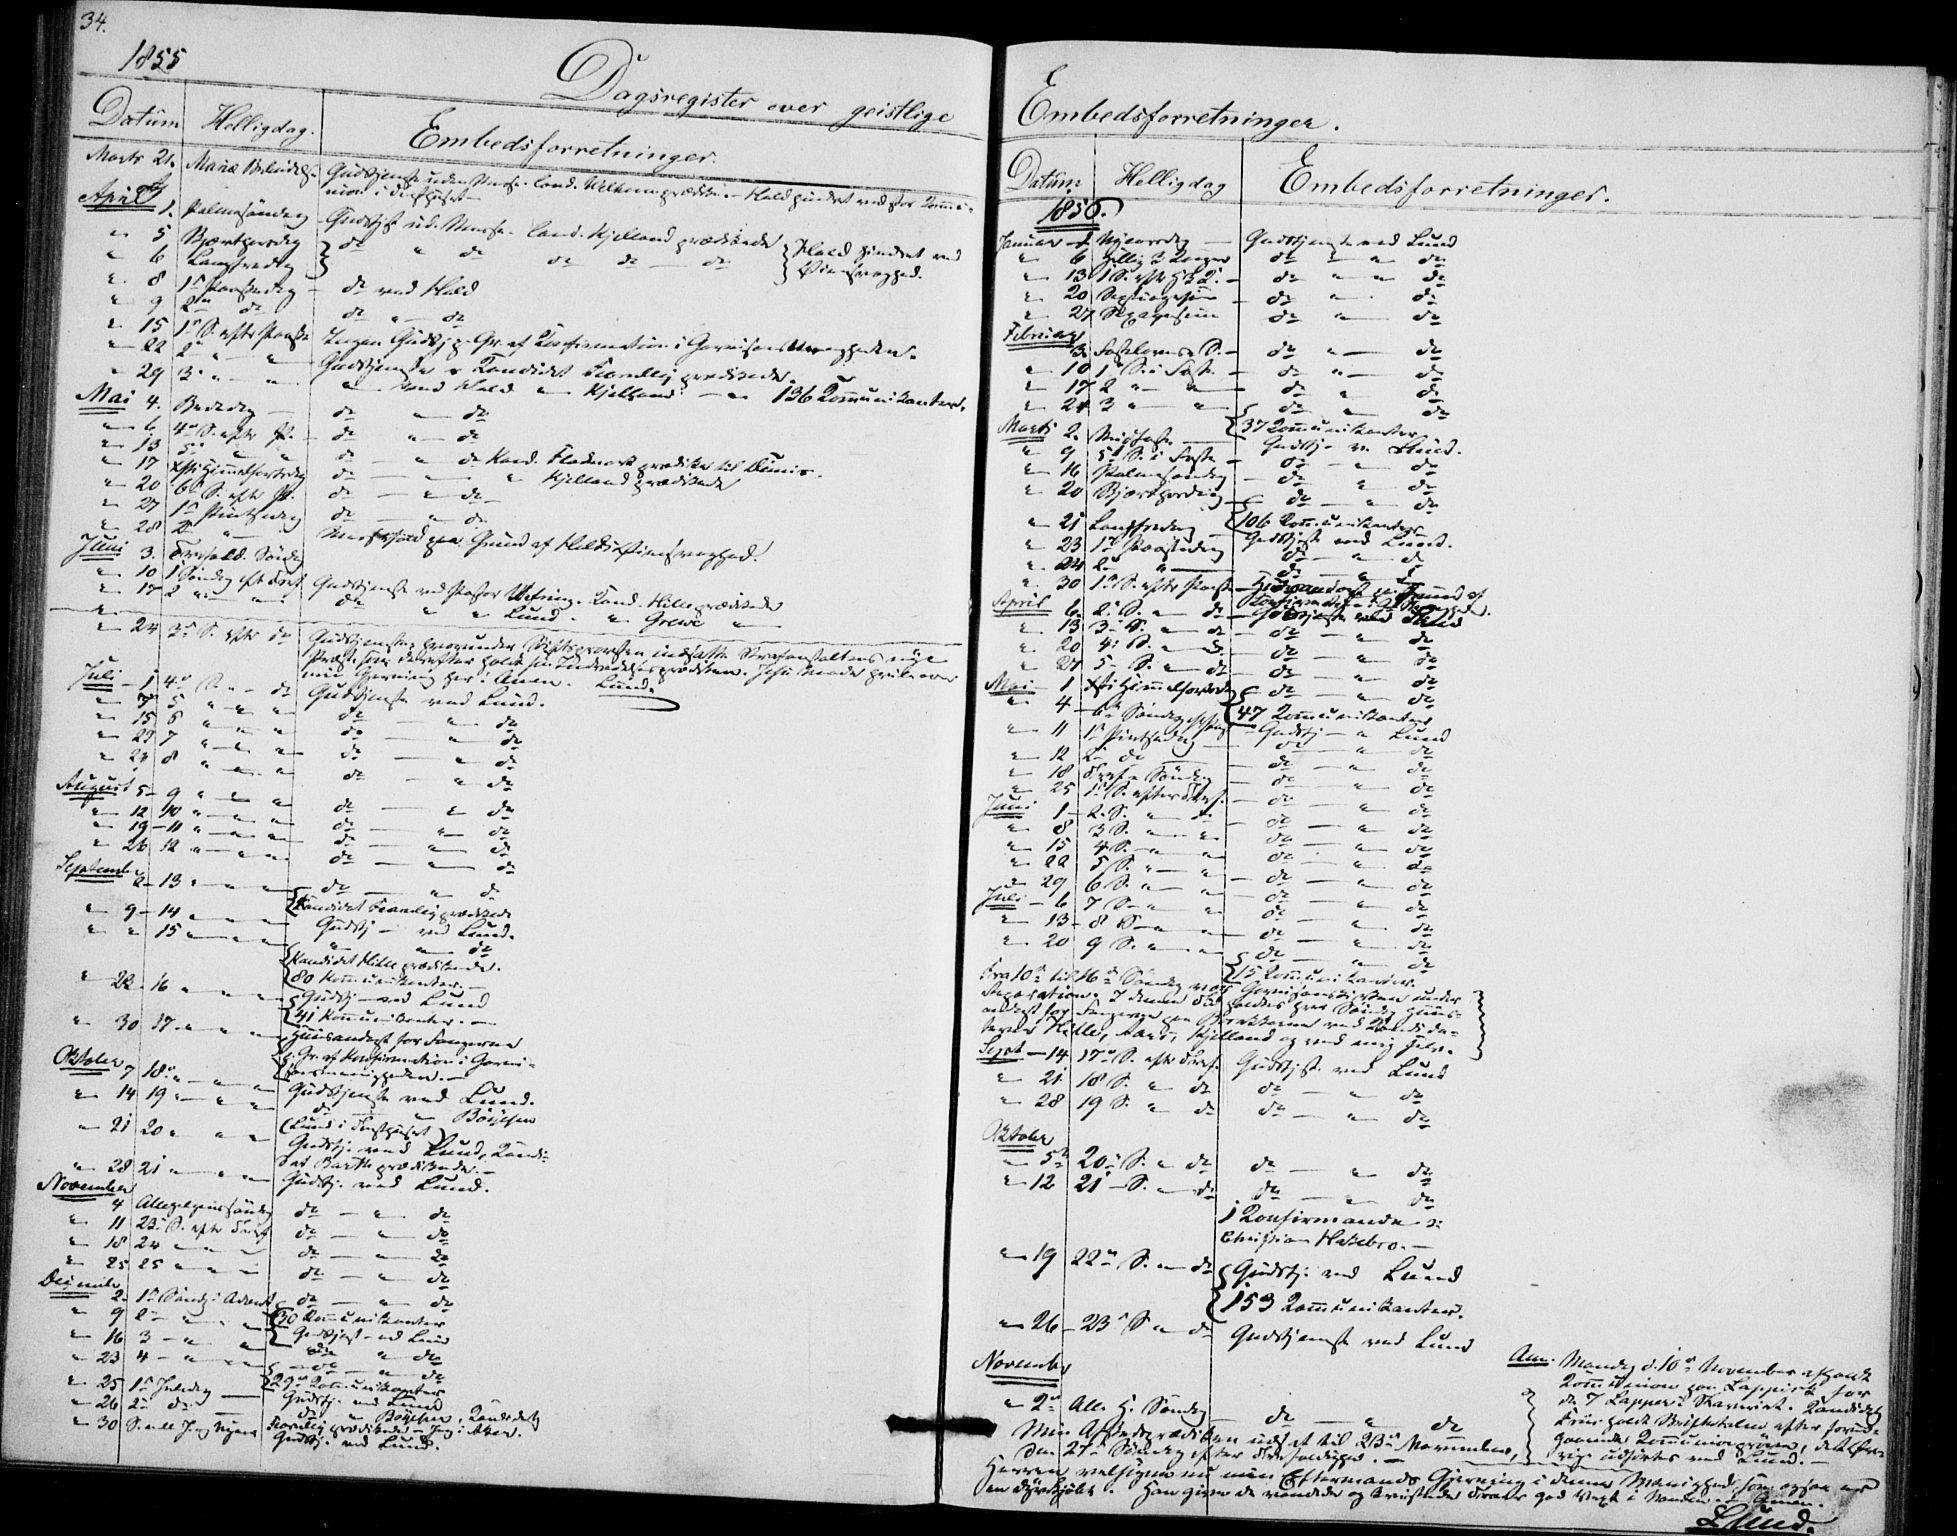 SAO, Akershus festnings slaveri Kirkebøker, F/Fa/L0002: Ministerialbok nr. 2, 1852-1883, s. 34